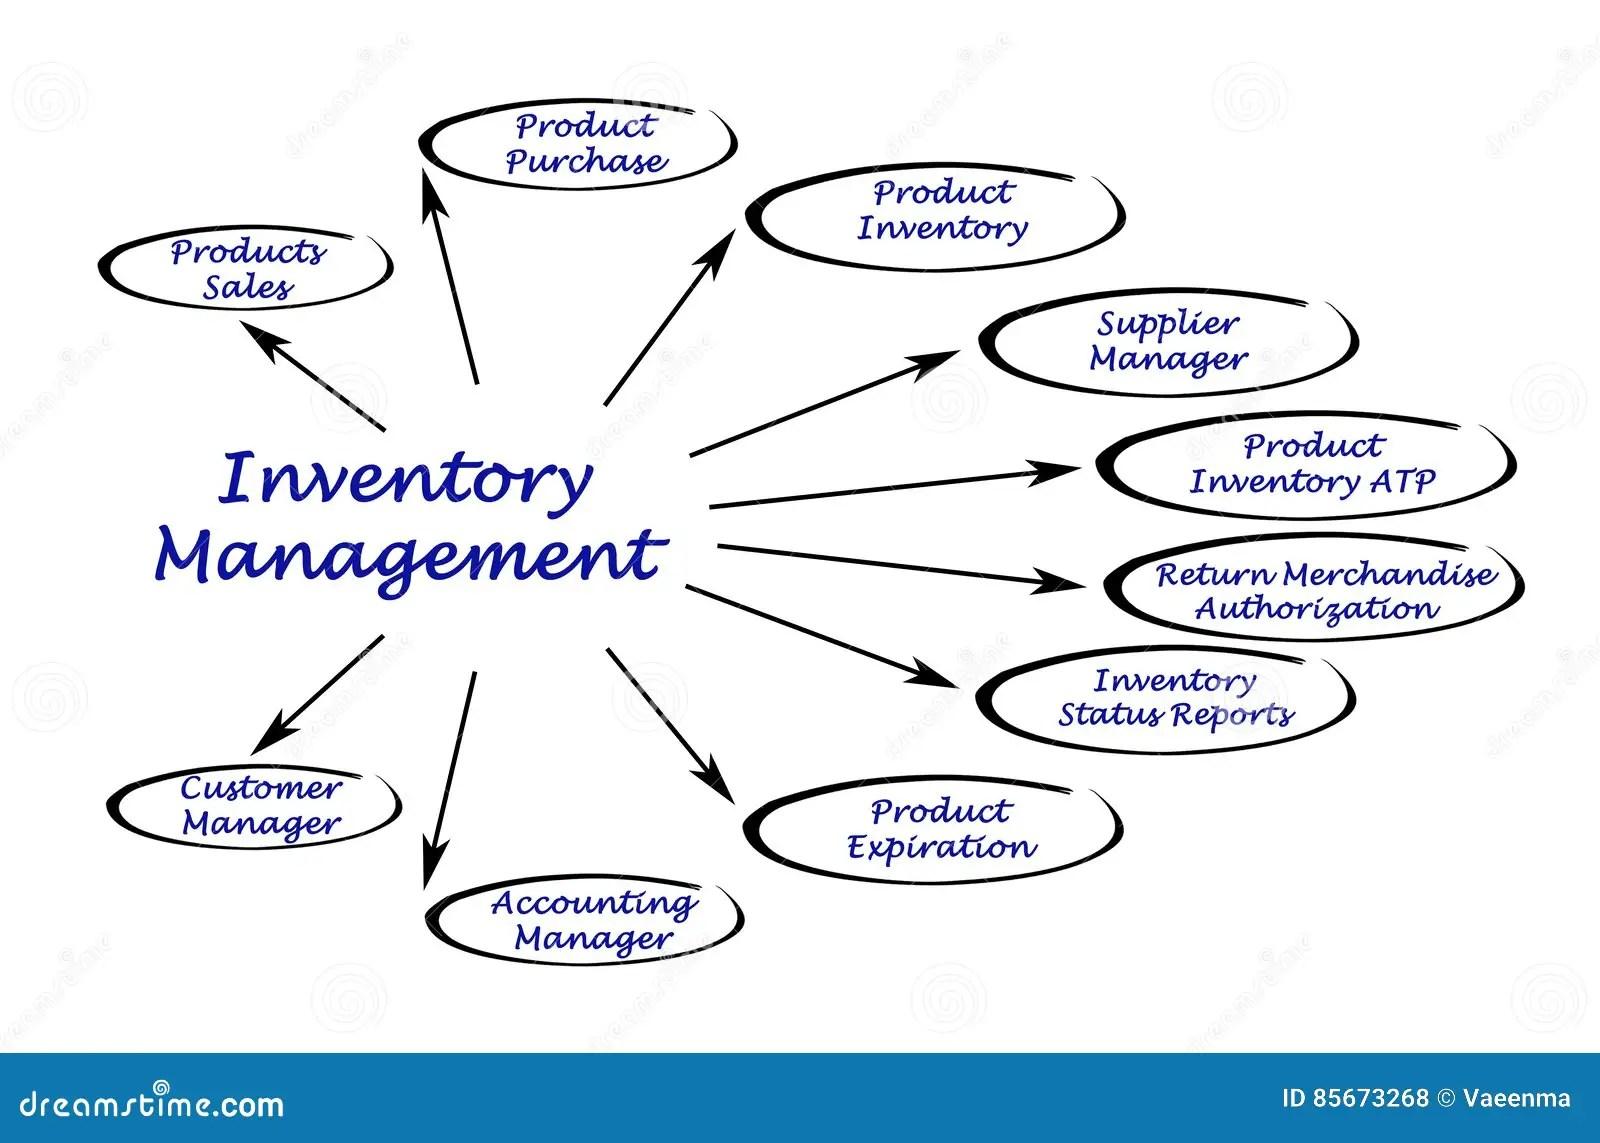 inventory management model diagram wiring of alternator stock illustration